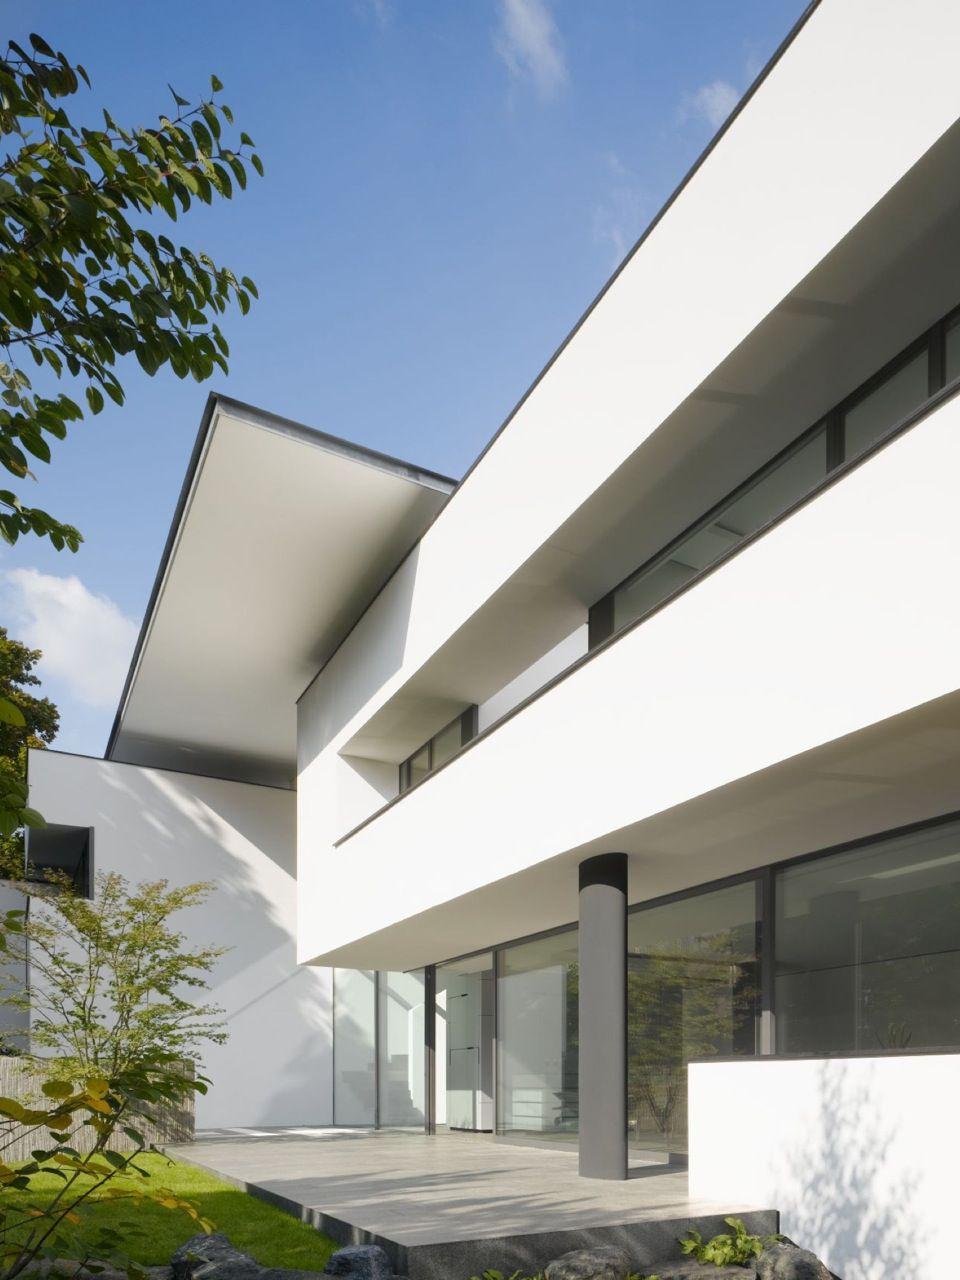 House-Heidehof-02-1